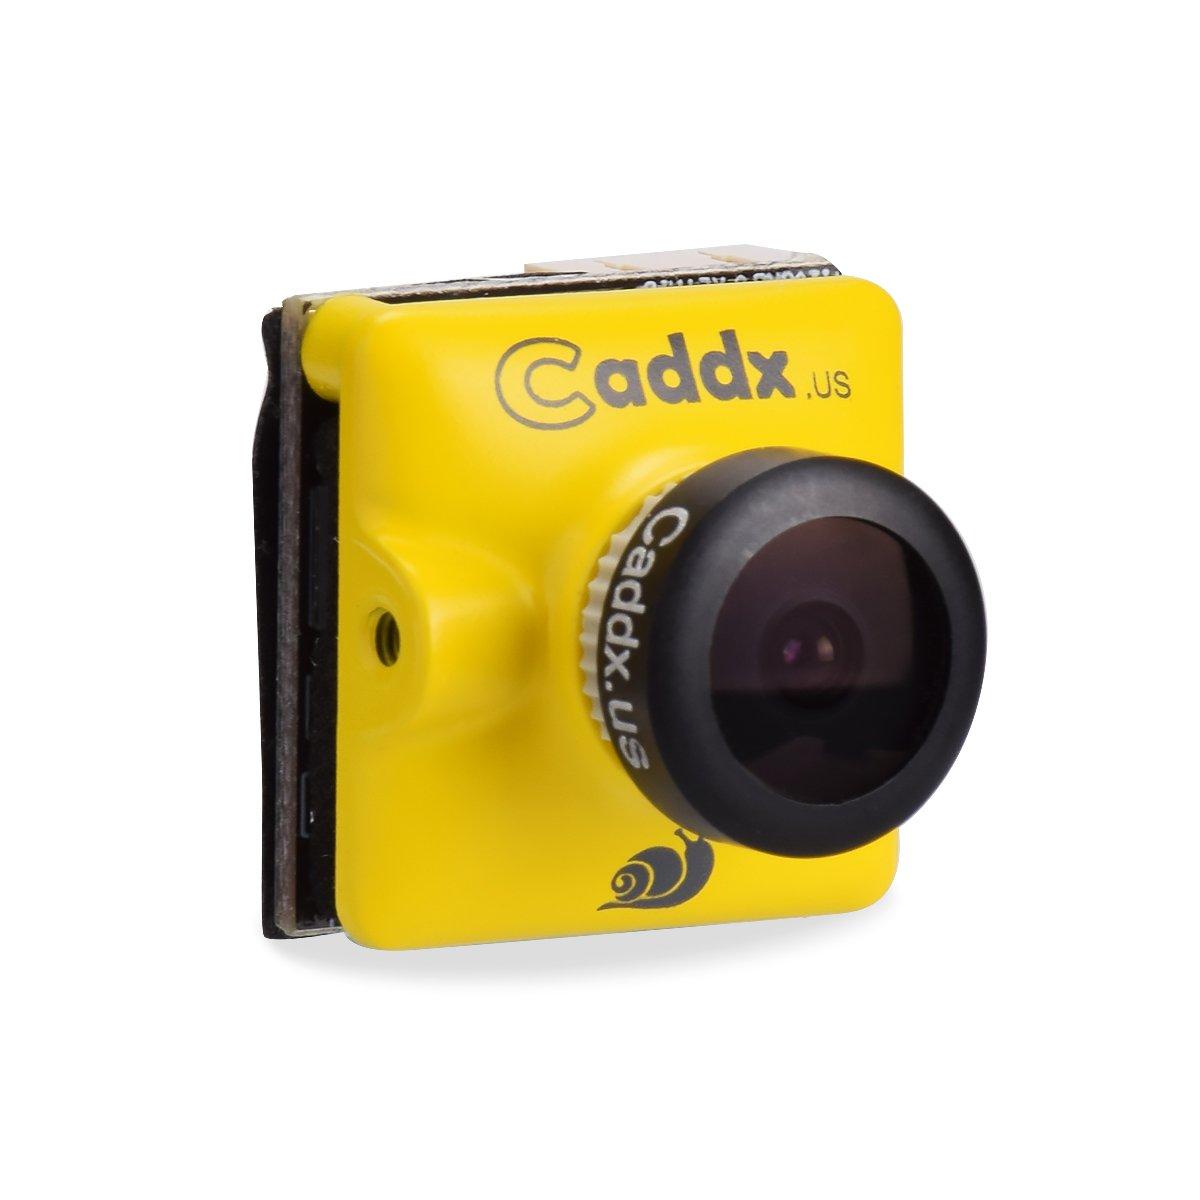 FPV Camera Caddx Turbo Micro F2 1200TVL 2.1mm Cam 1/3'' CMOS 16:9 NTSC PAL Switchable 2.1mm IR Blocked Yellow for FPV Racing Drone